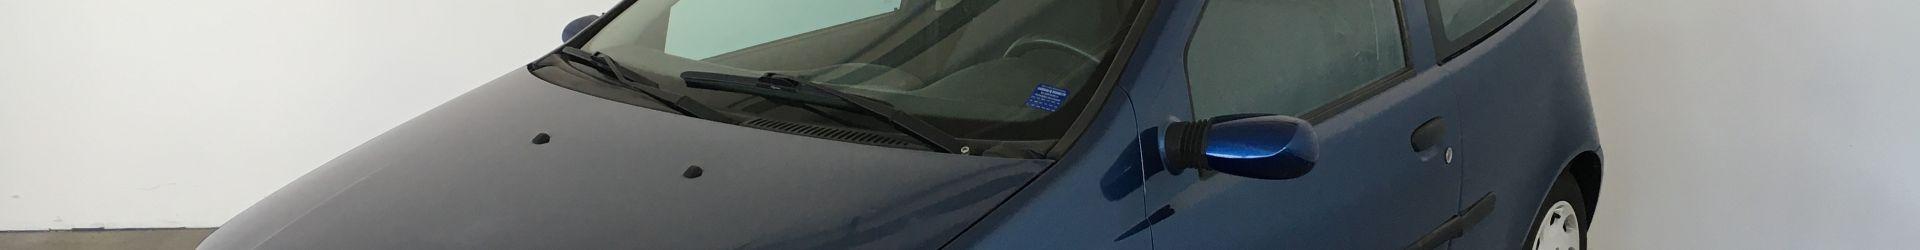 FIAT Punto 1.2i 16V cat 3 porte